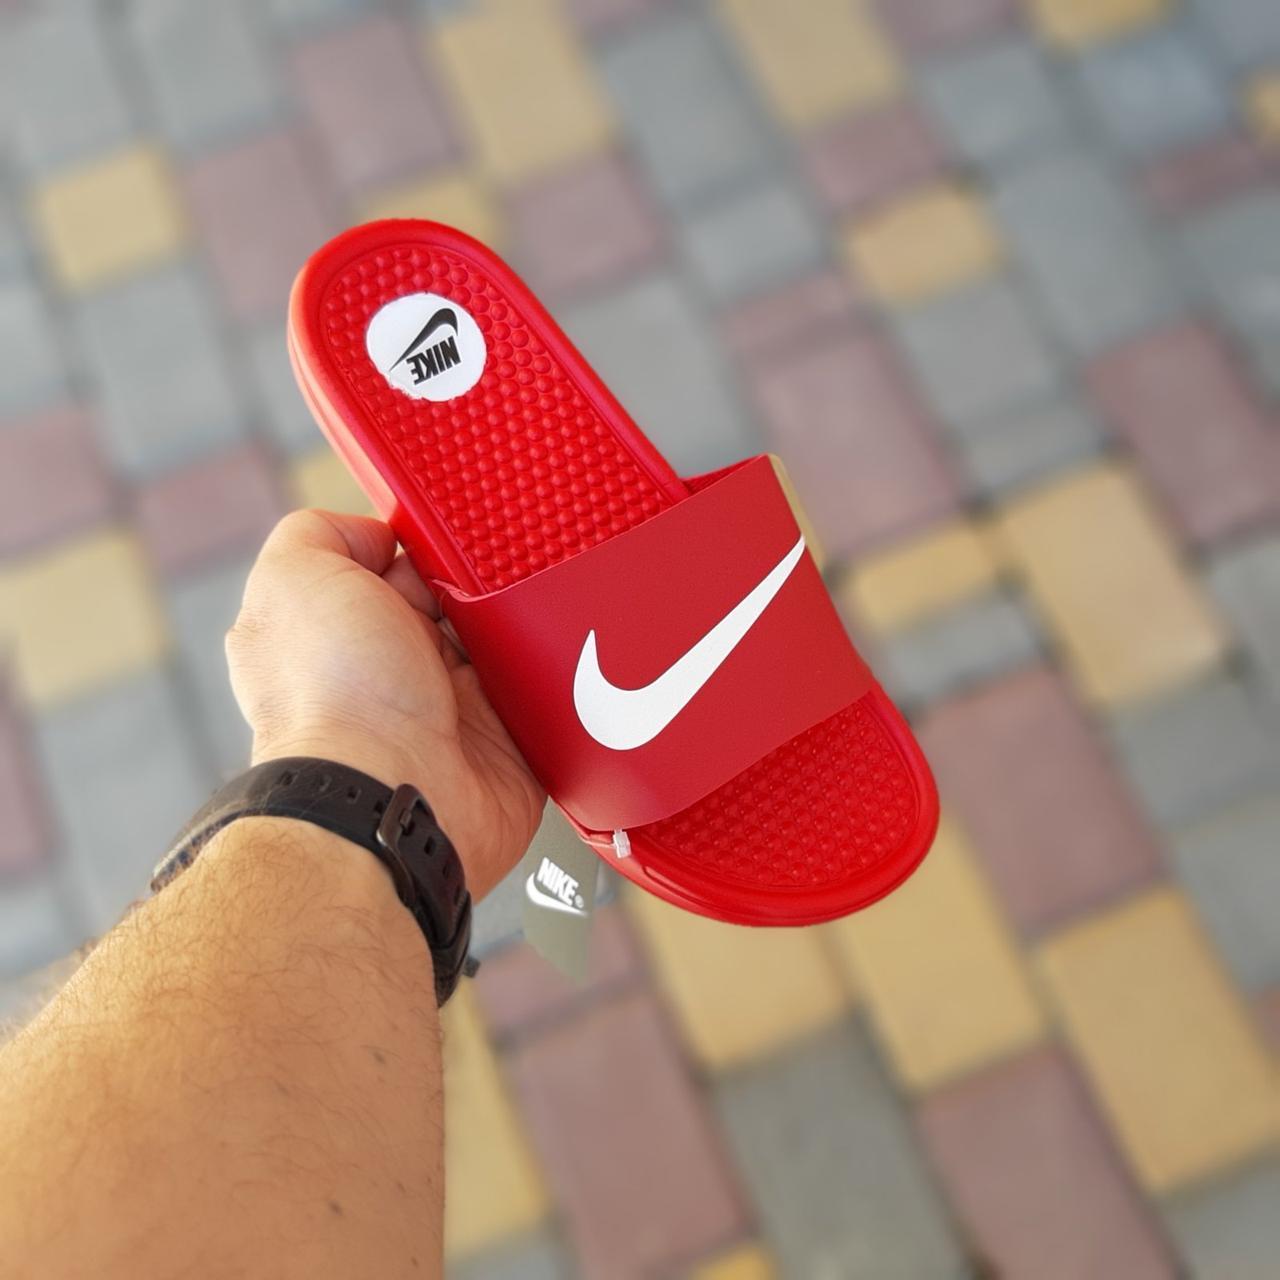 Женские сланцы Nike Red,реплика